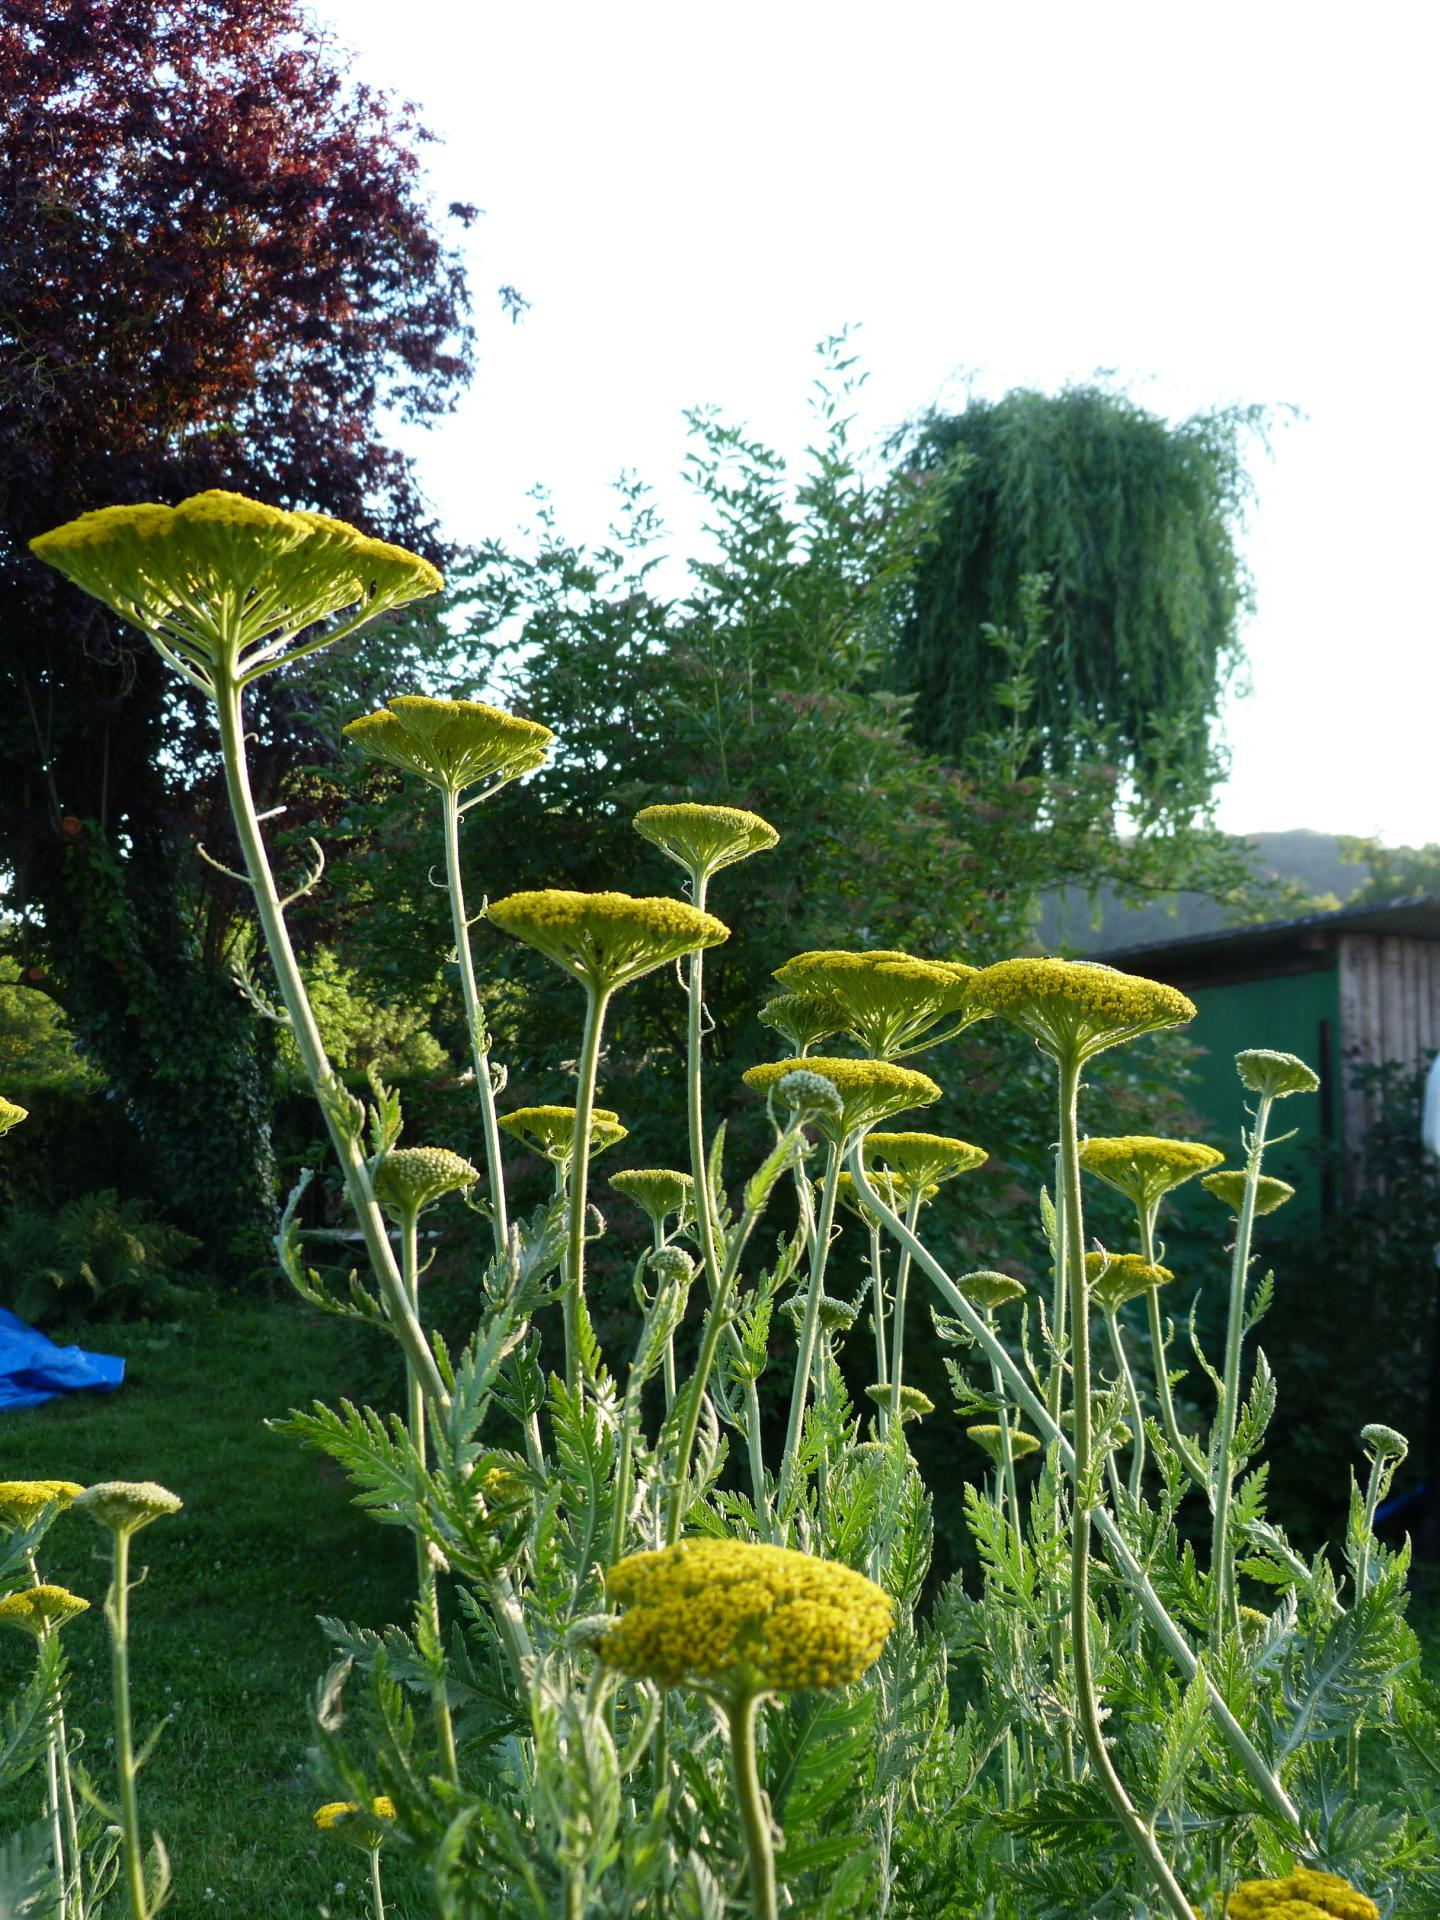 Jardinles especes achilleejaune 9 1